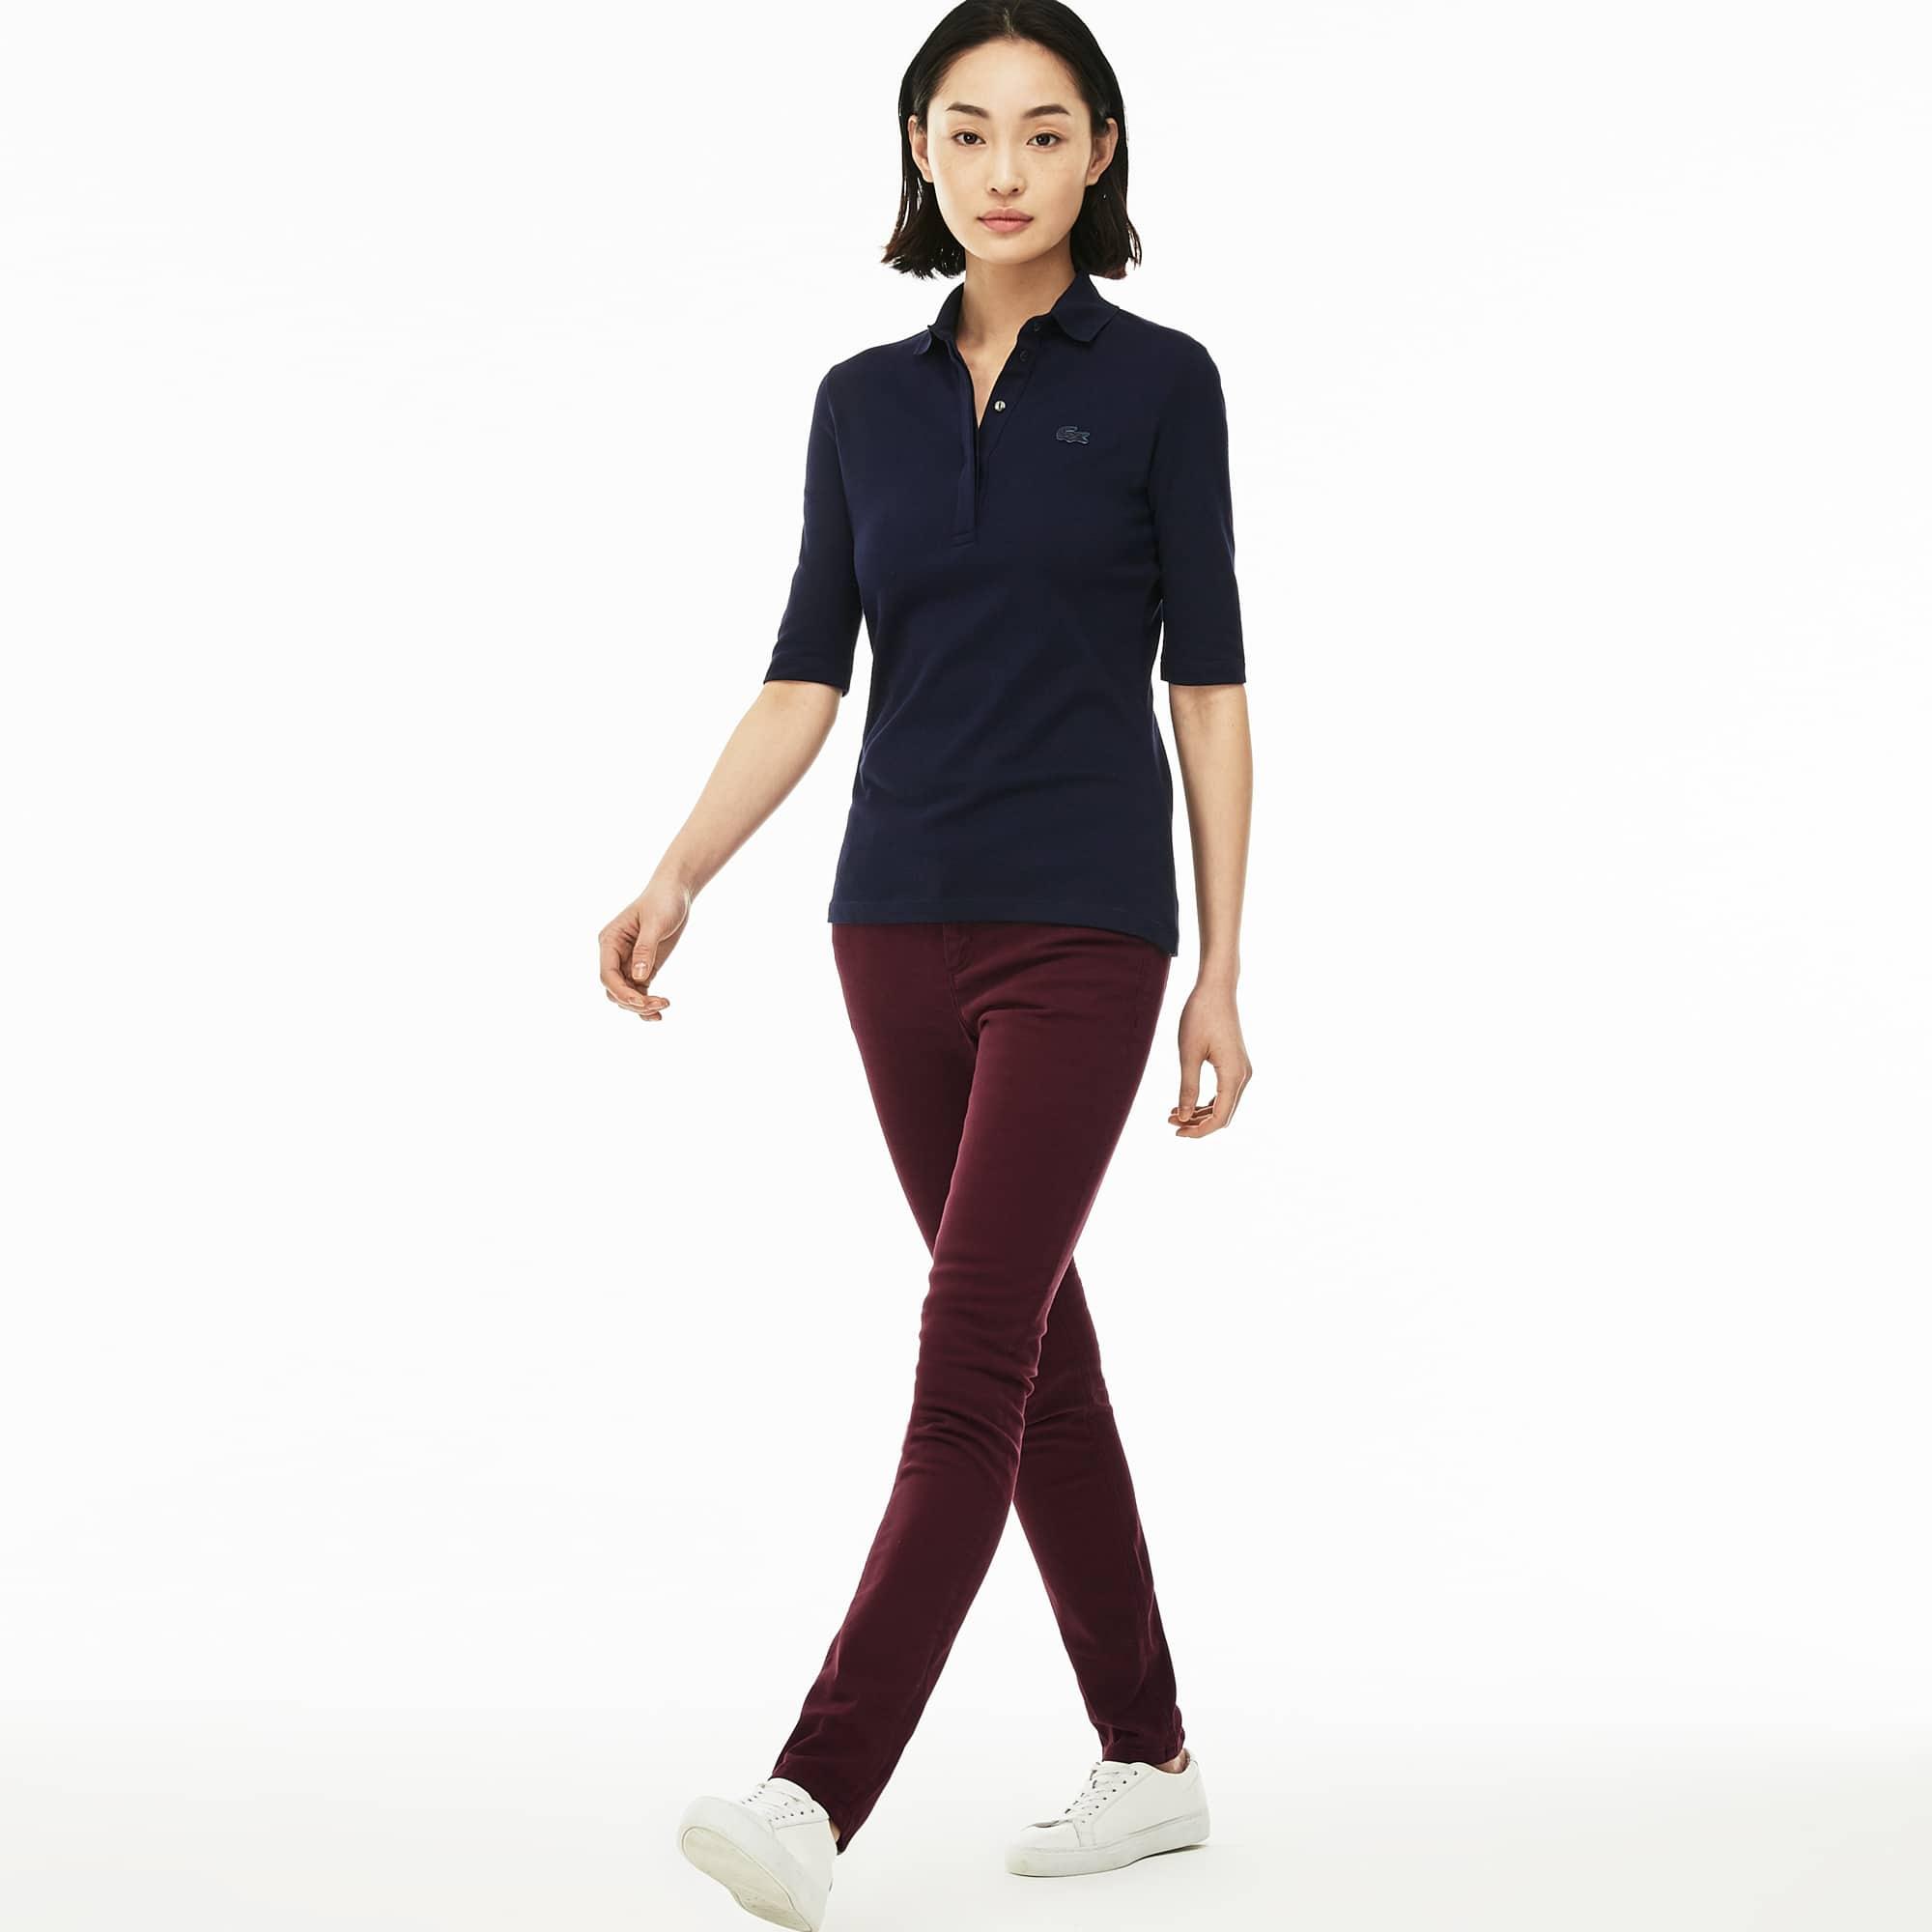 Women's Slim Fit Stretch Cotton Denim Jeans